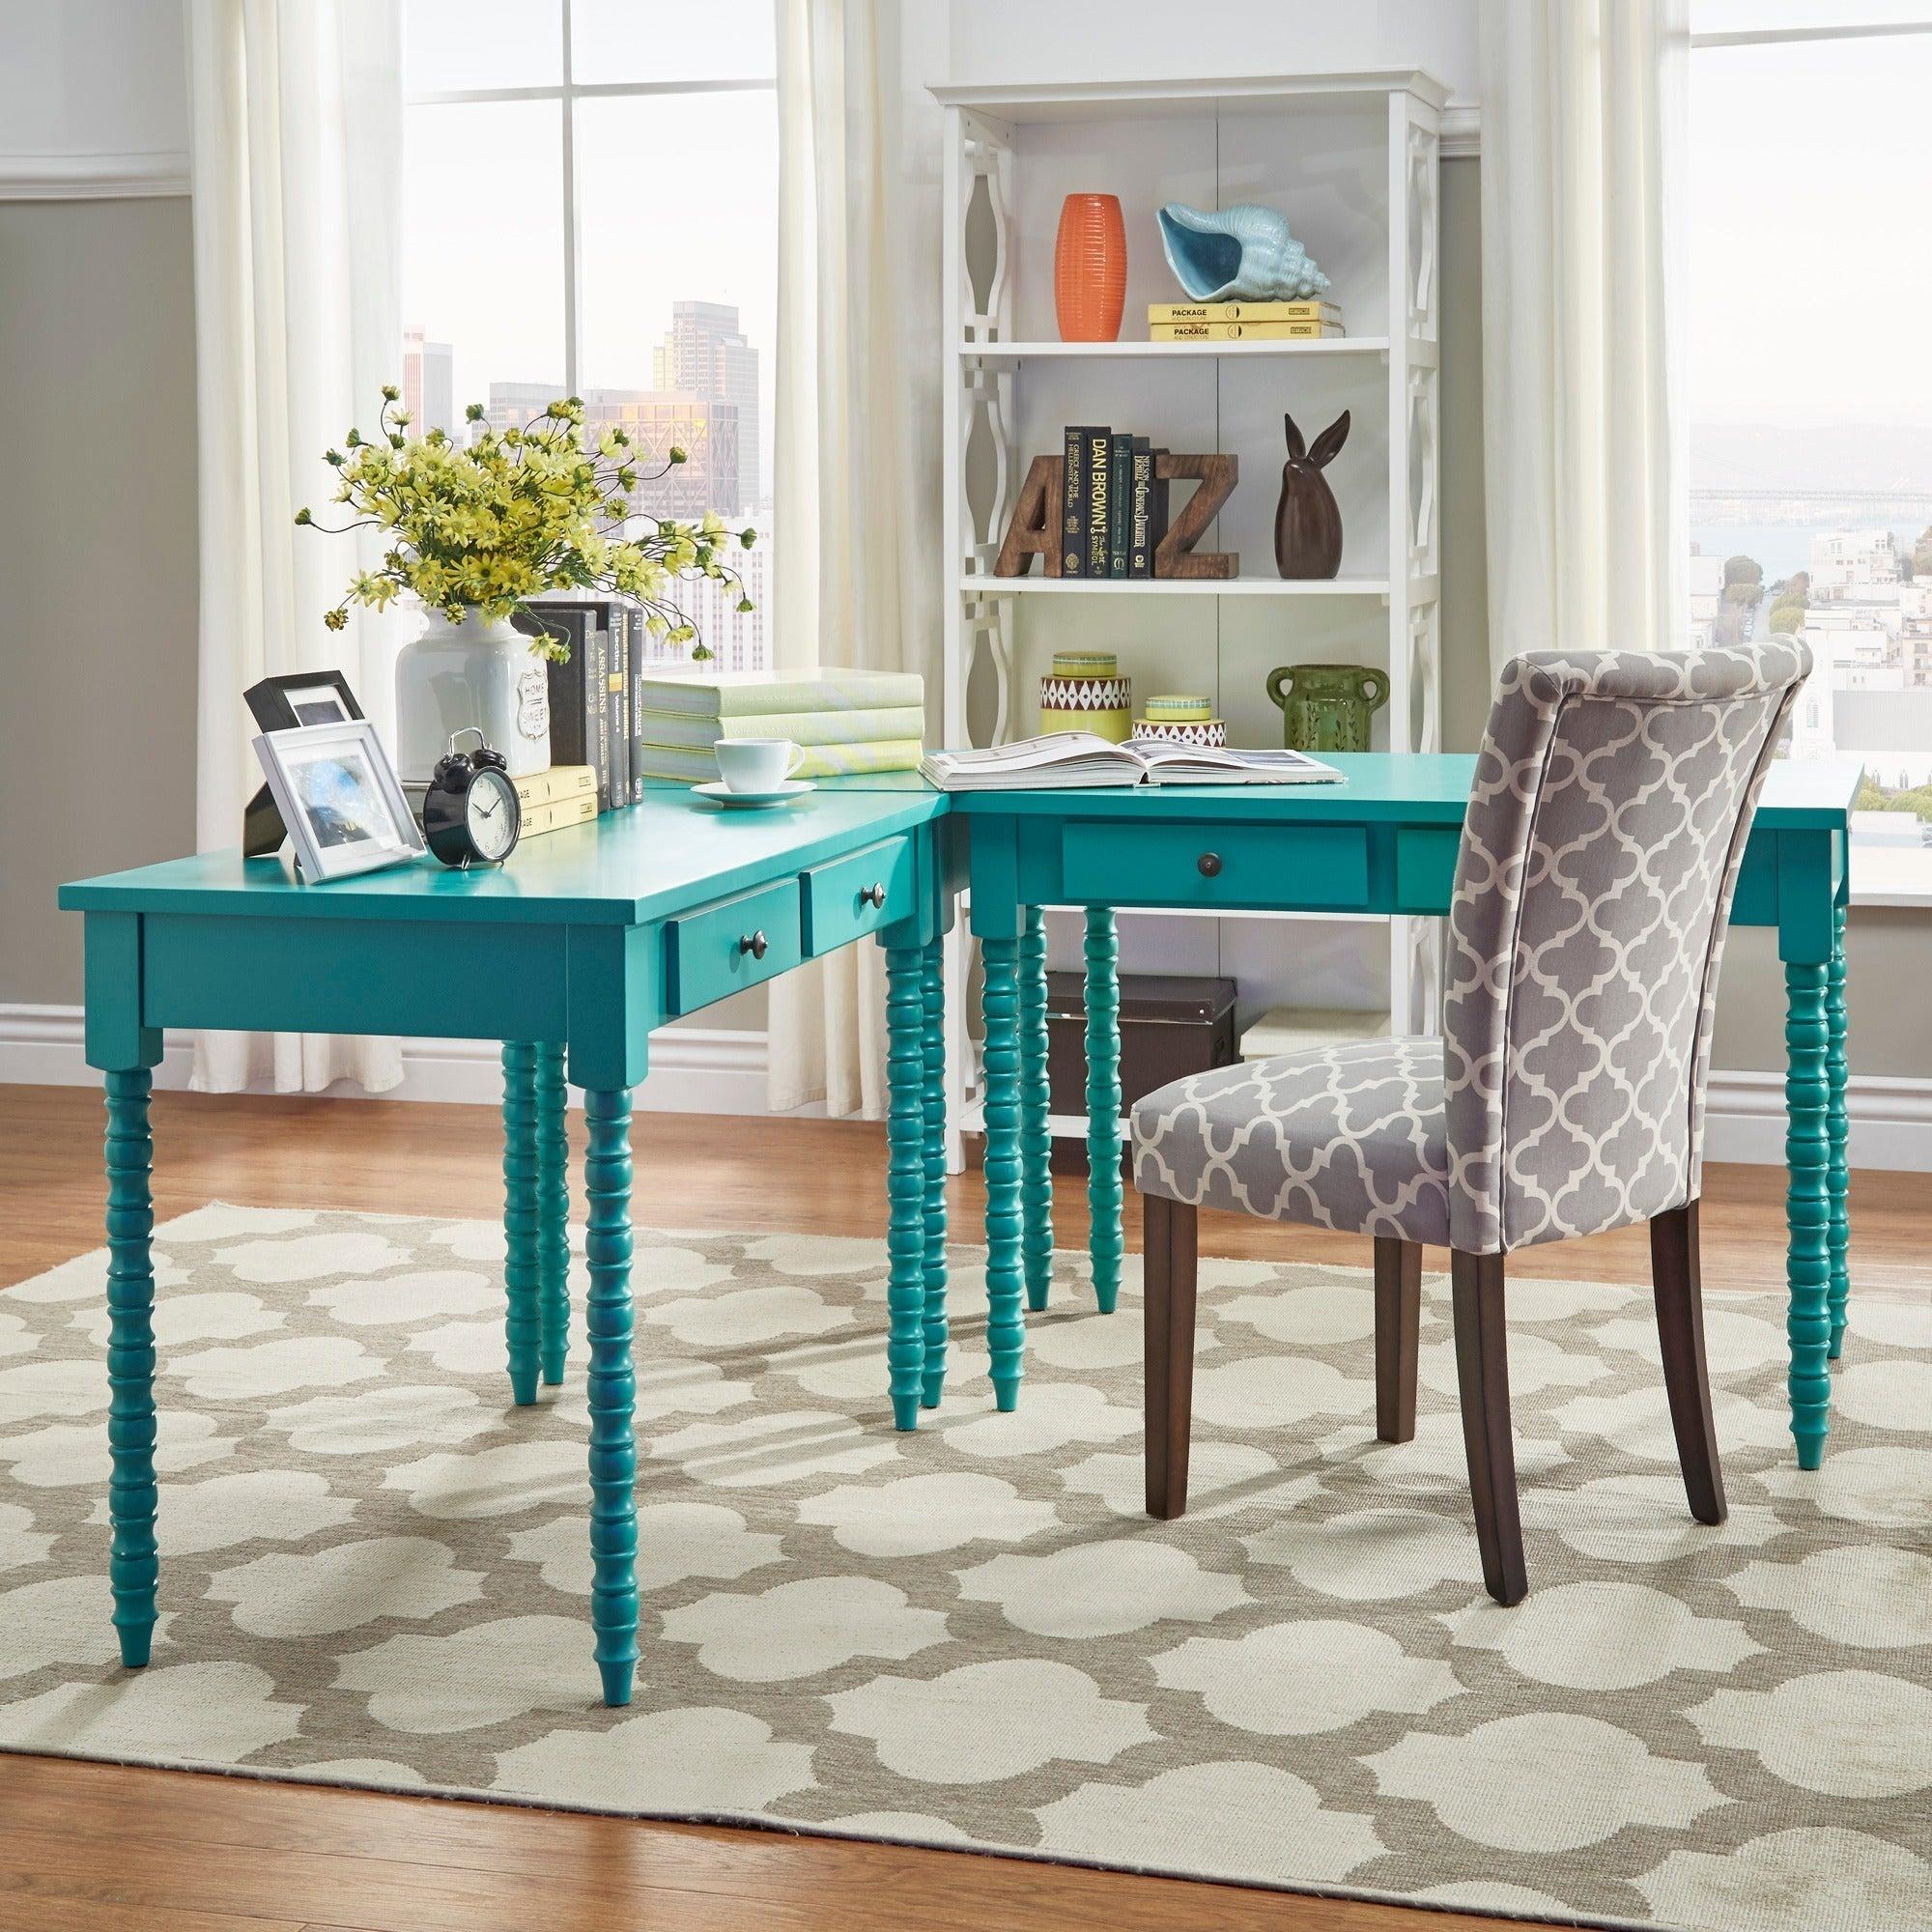 Shop Lyndale L-Shaped Helix Legs Corner Office Desk by iNSPIRE Q ...